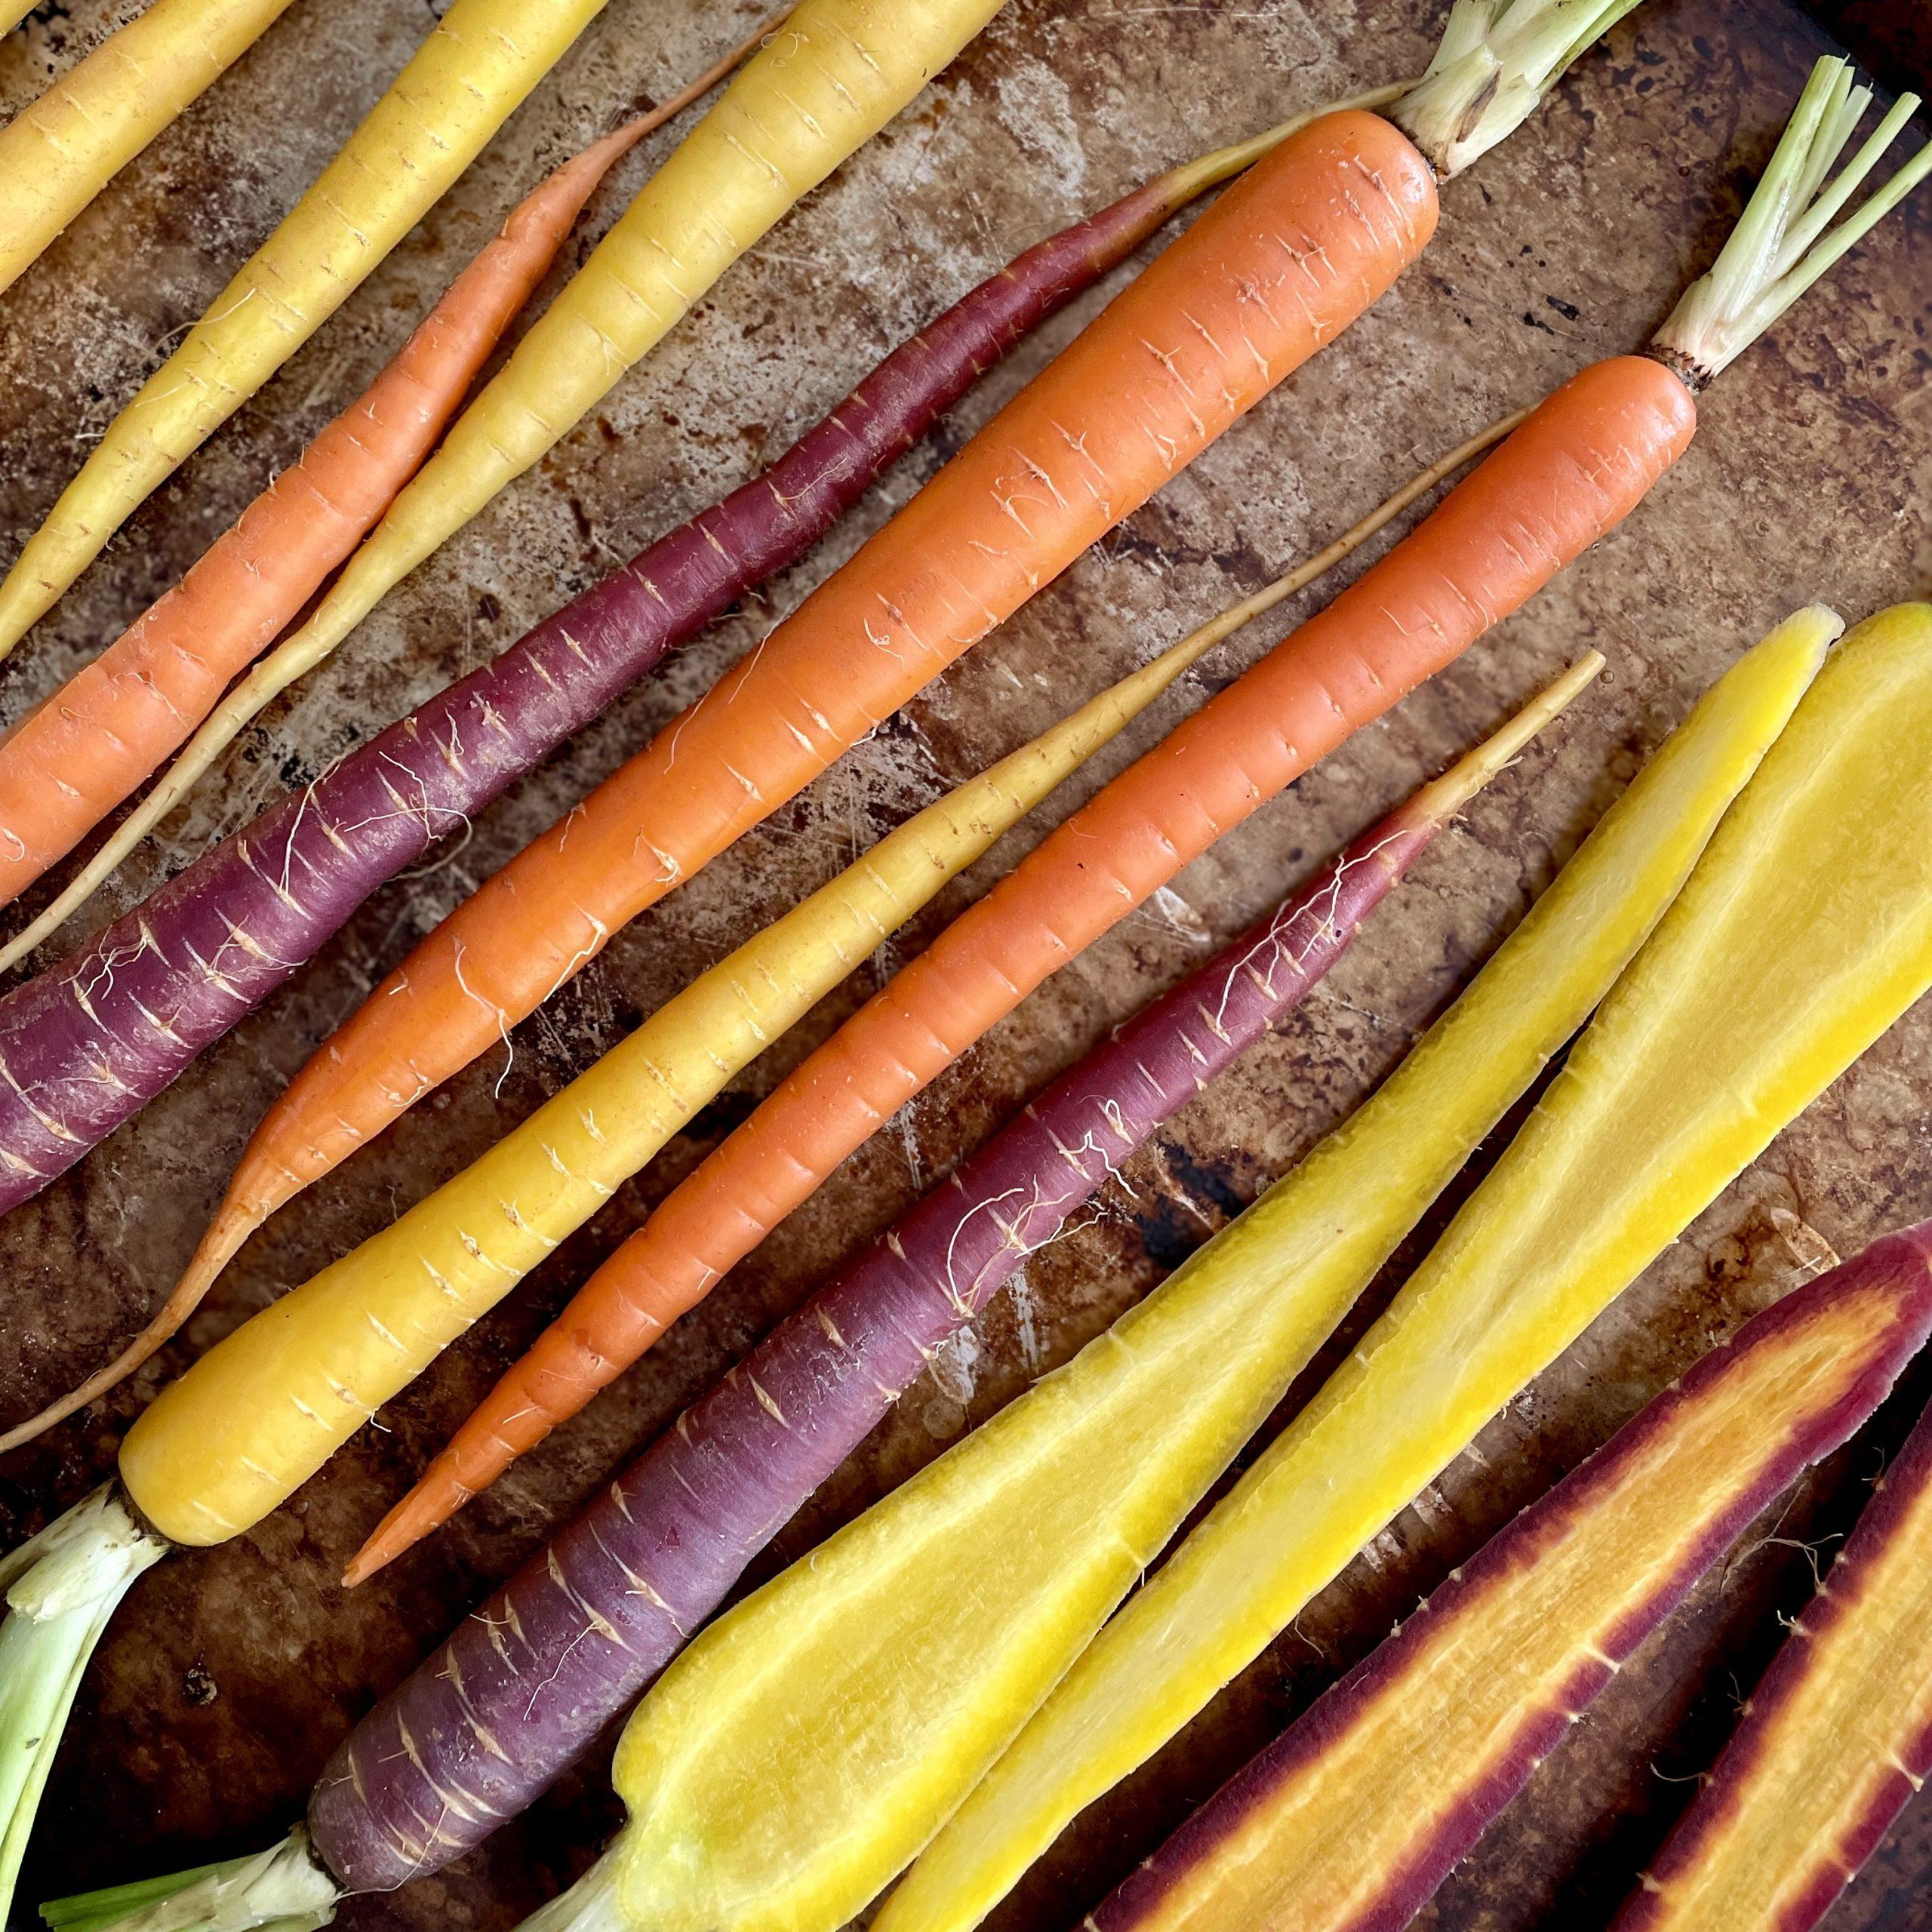 Rainbow carrots before roasting